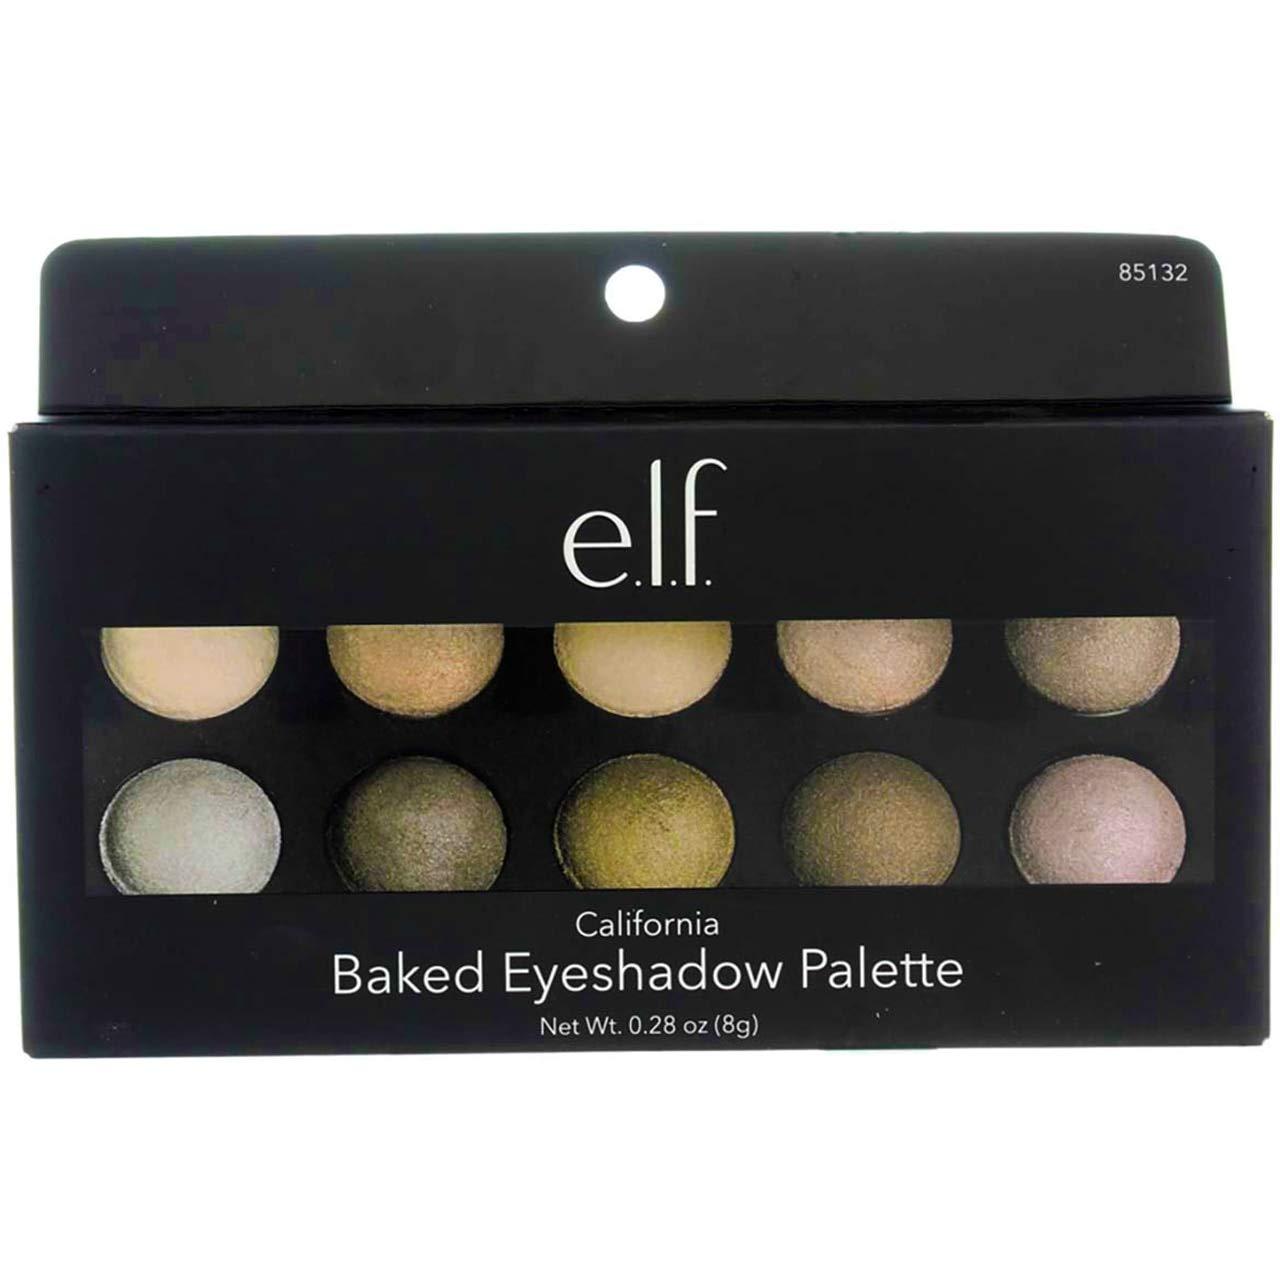 e.l.f. Baked Eyeshadow Palette, California, Net Wt 0.28oz (8g)